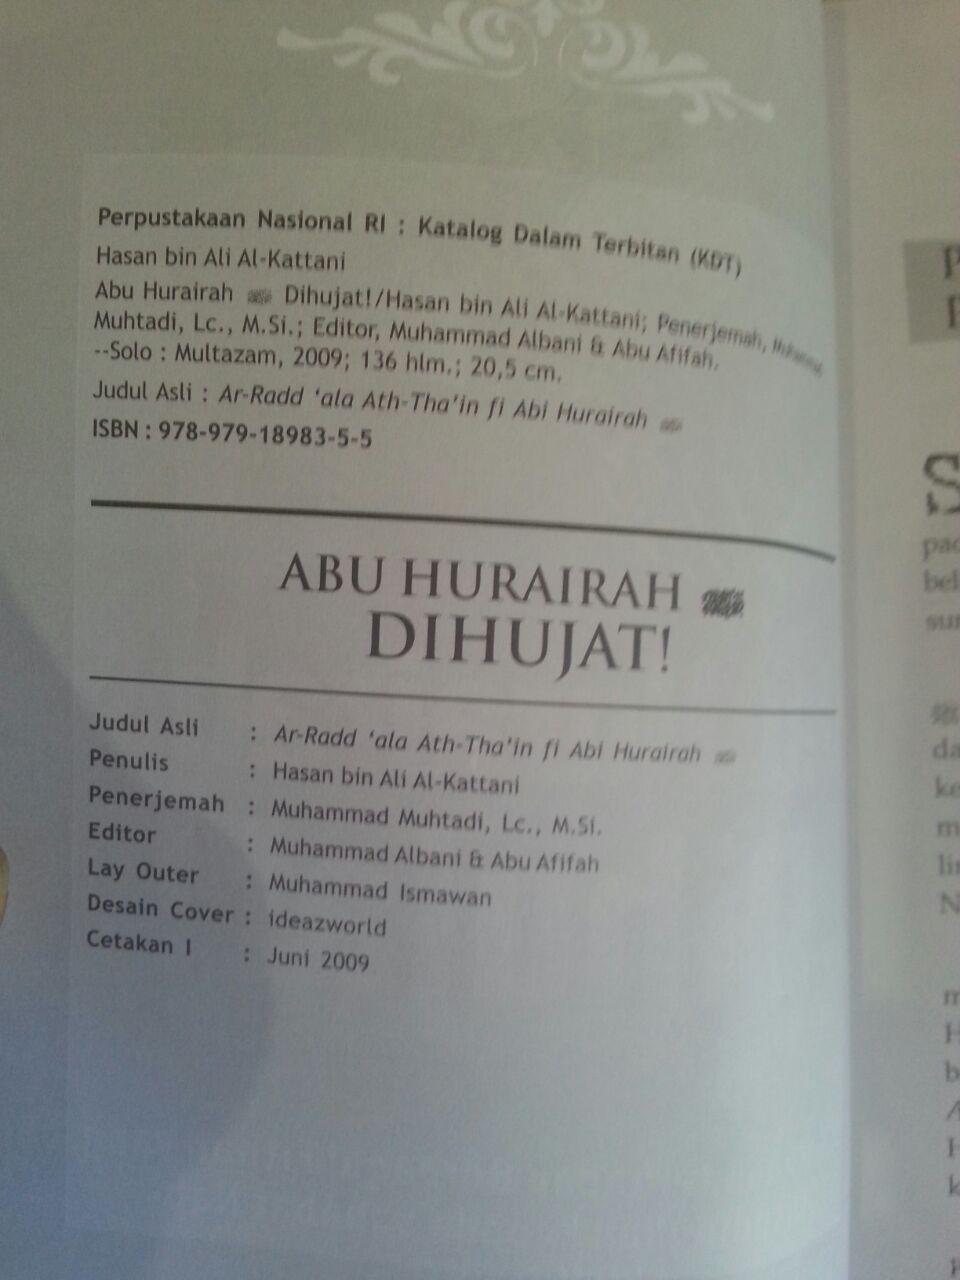 Buku Abu Hurairah Dihujat Bantahan Terhadap Berbagai Fitnah isi 2